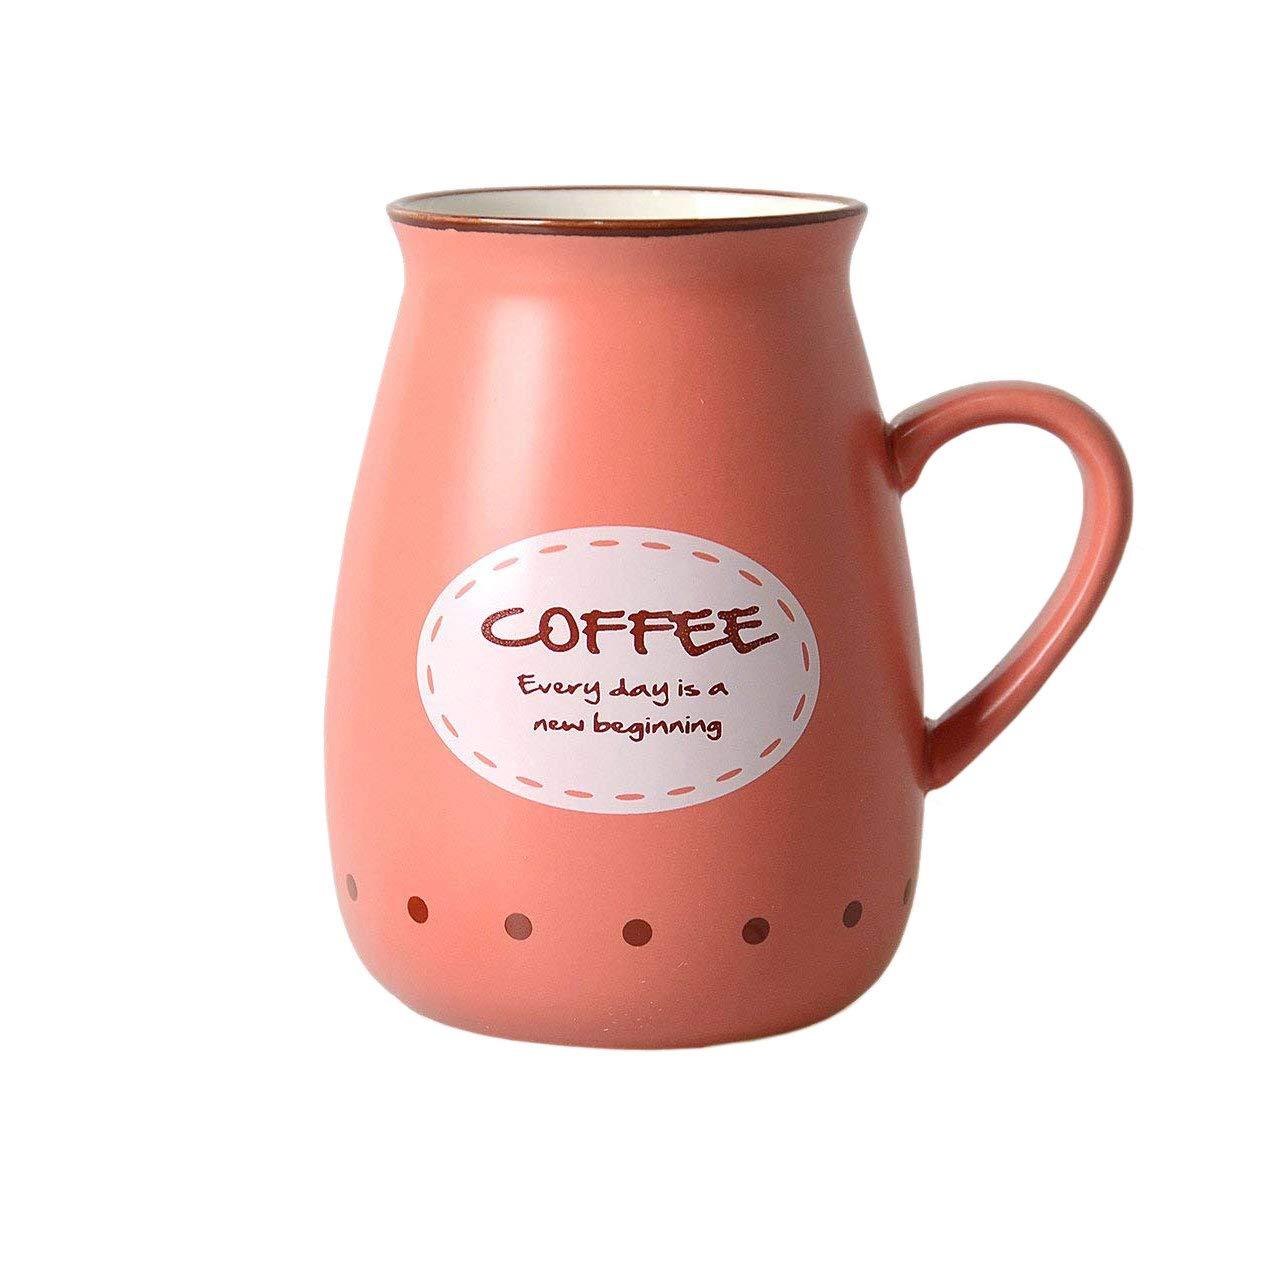 Hwagui - Cute Blue Ceramic Tea & Coffee Mug 200ml/6.8oz coffee-01